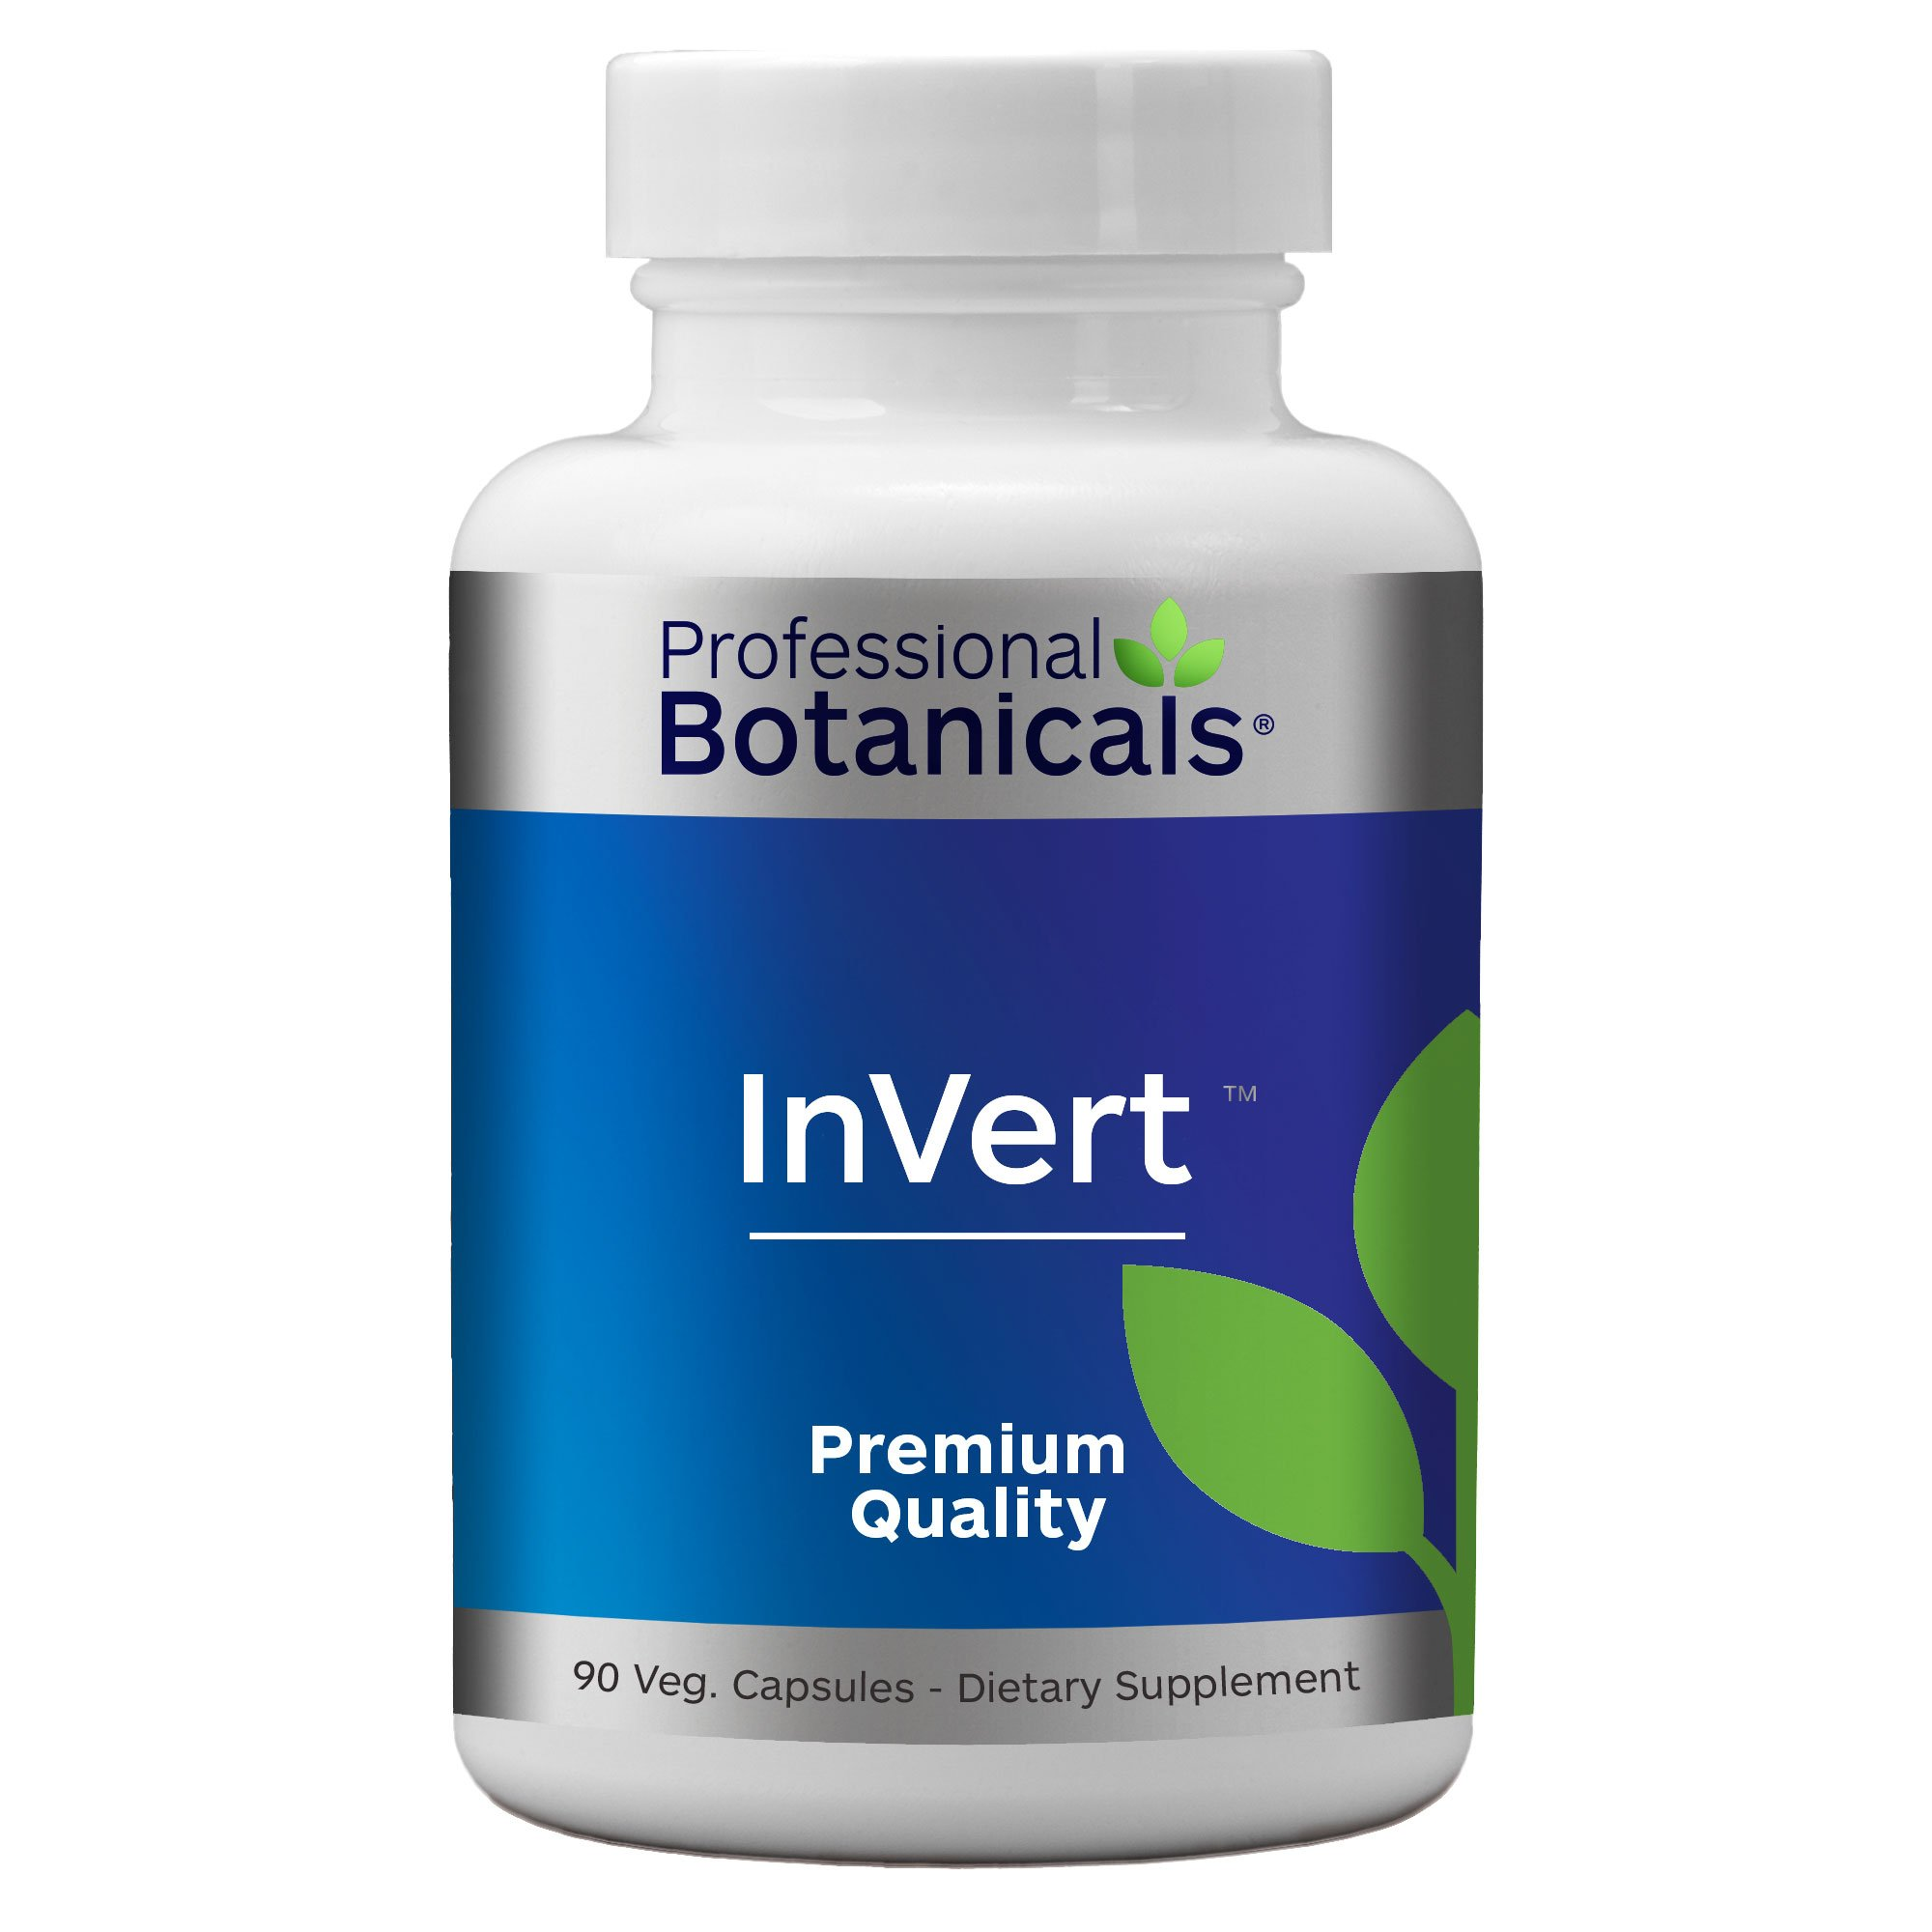 Professional Botanicals Invert - Natural Herbal Vegan Vertigo Motion Sickness Nausea Relief - 90 Veg Capsules